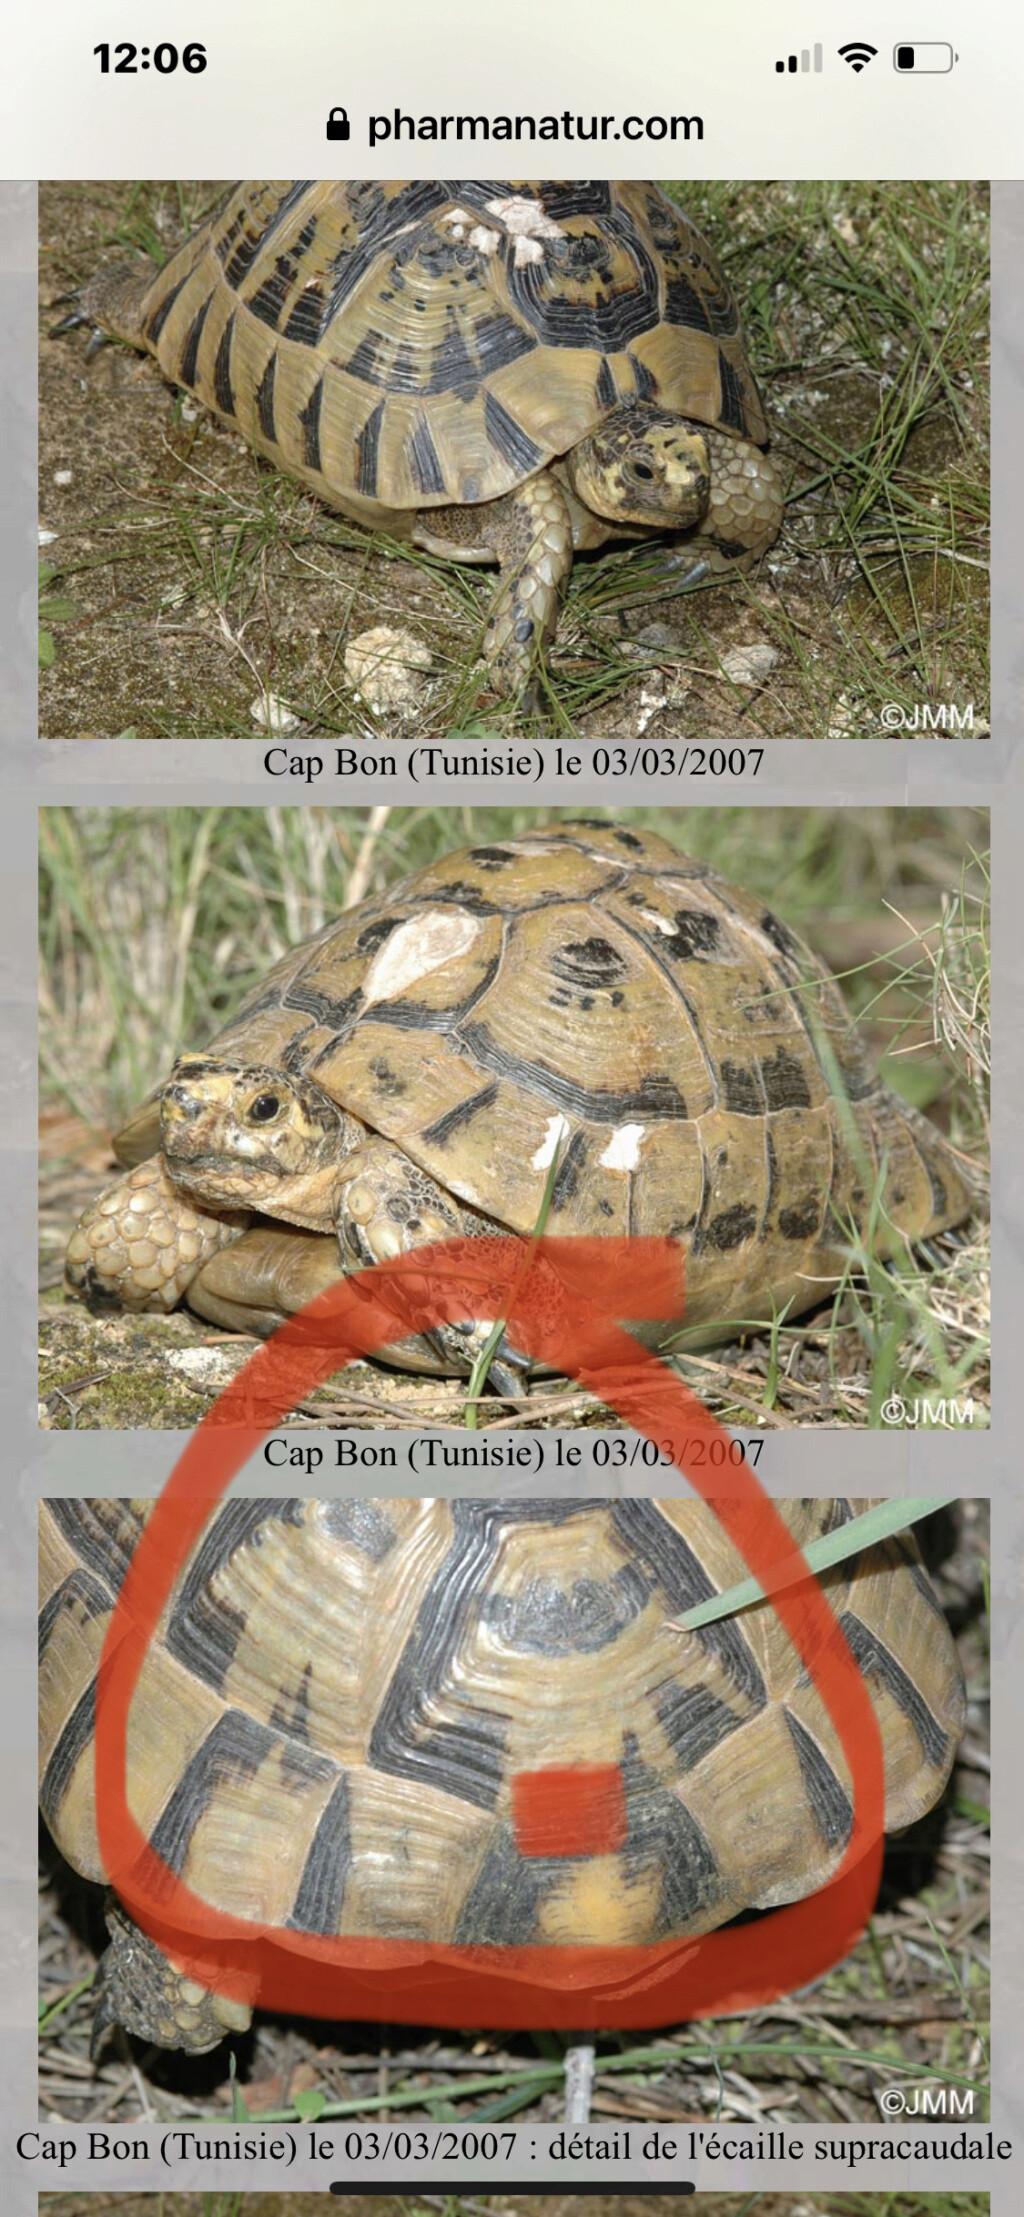 Identification de ma tortue Tank - 1 - Page 2 B13b3210